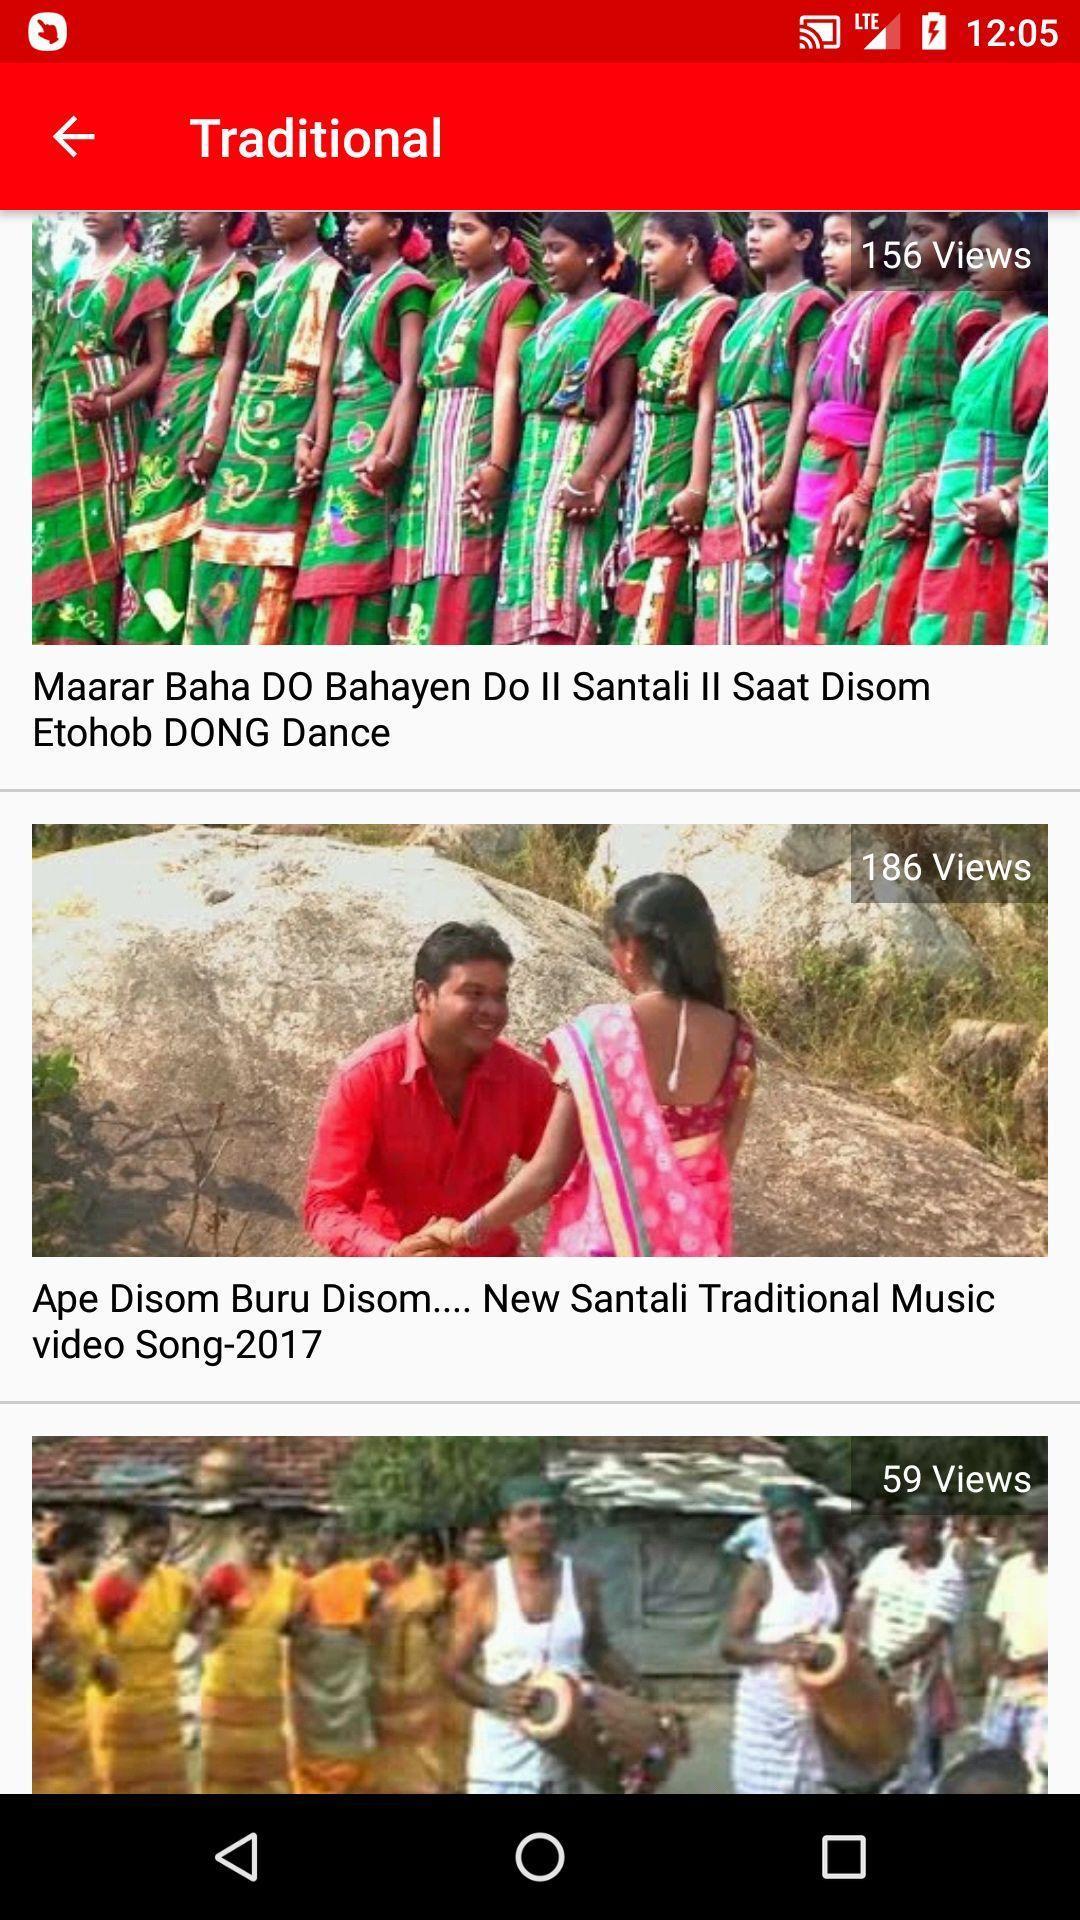 Santali Videos 2020 - Santali Song, DJ, Comedy 💃 for Android - APK Download